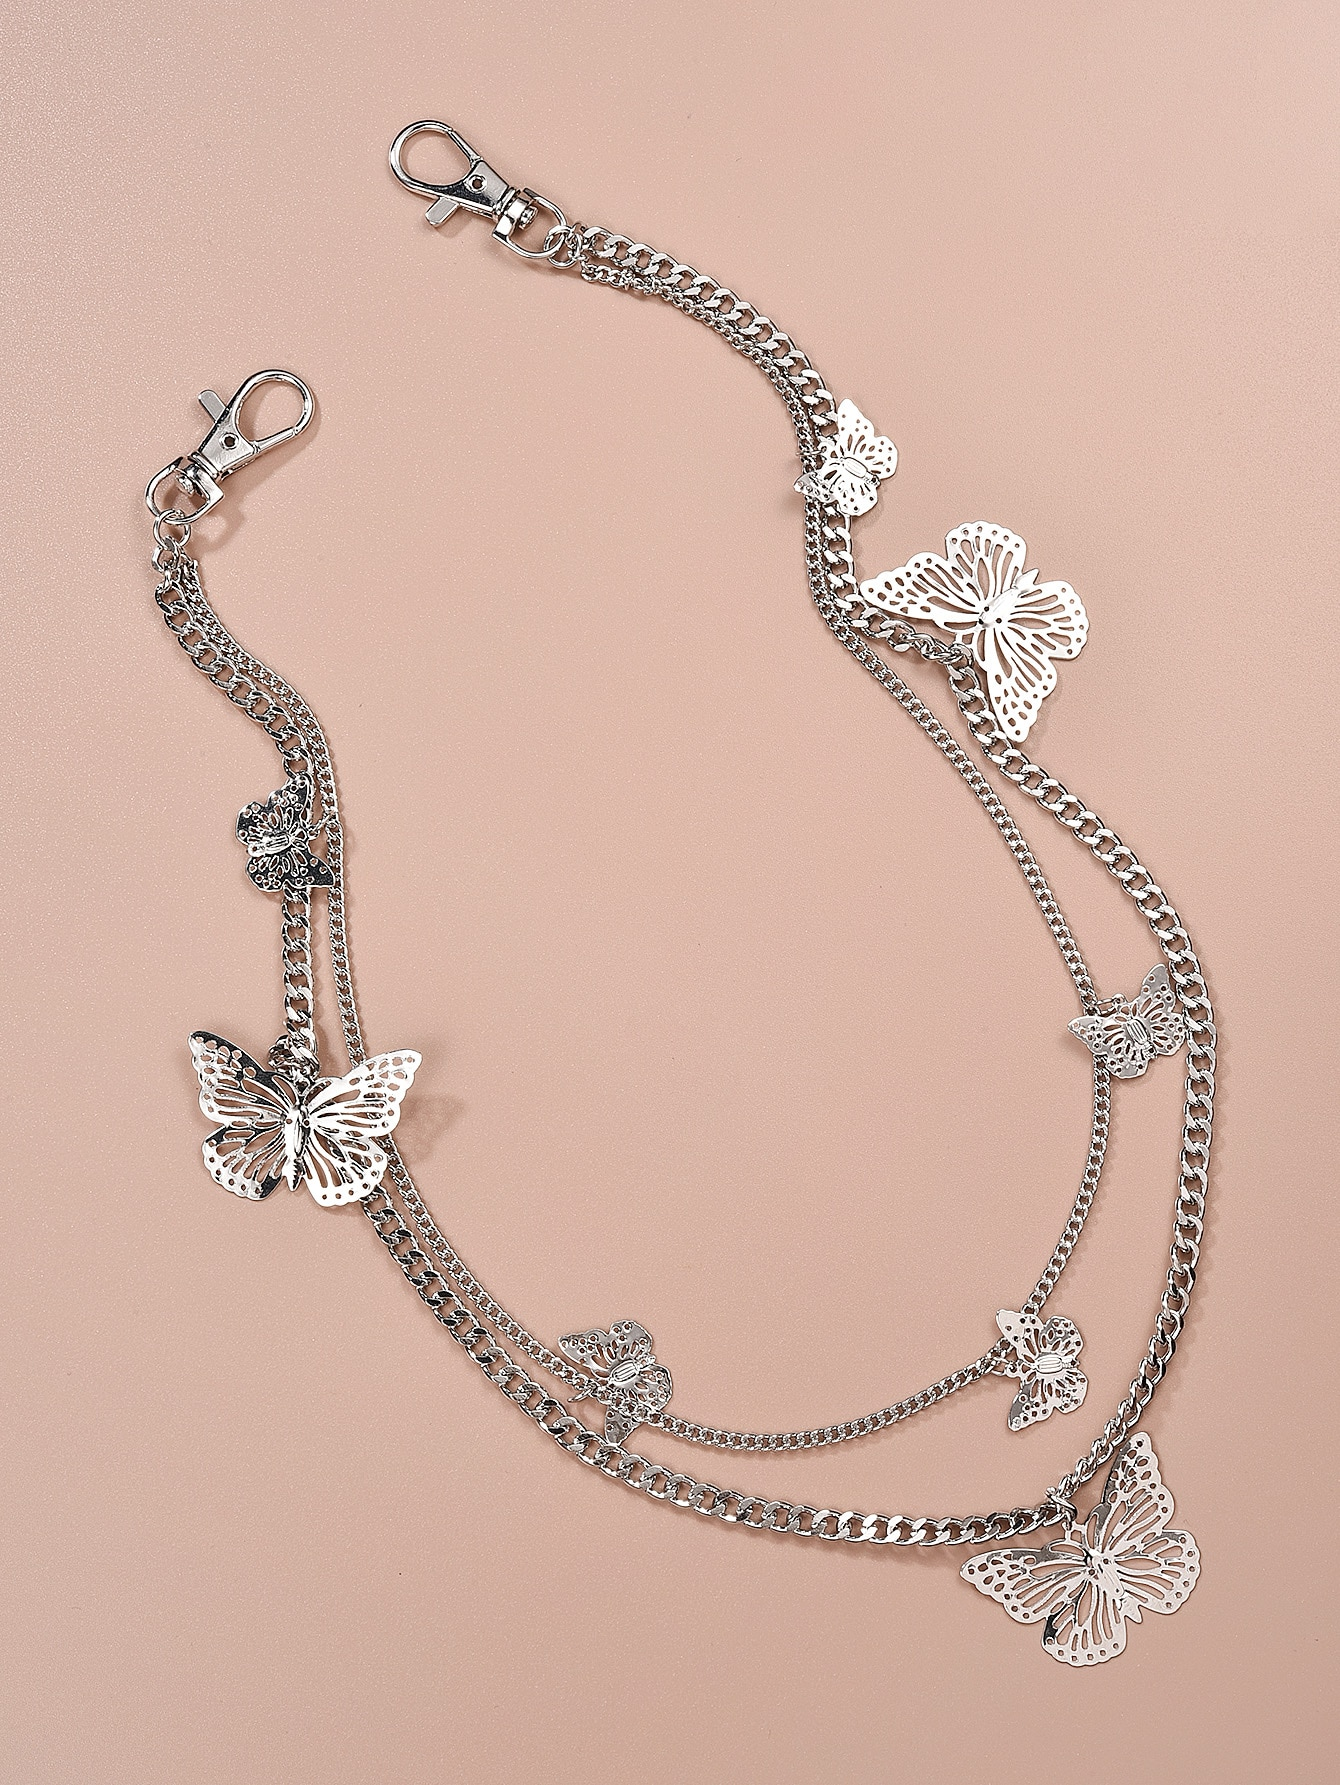 Butterfly Charm Layered Waist Chain thumbnail